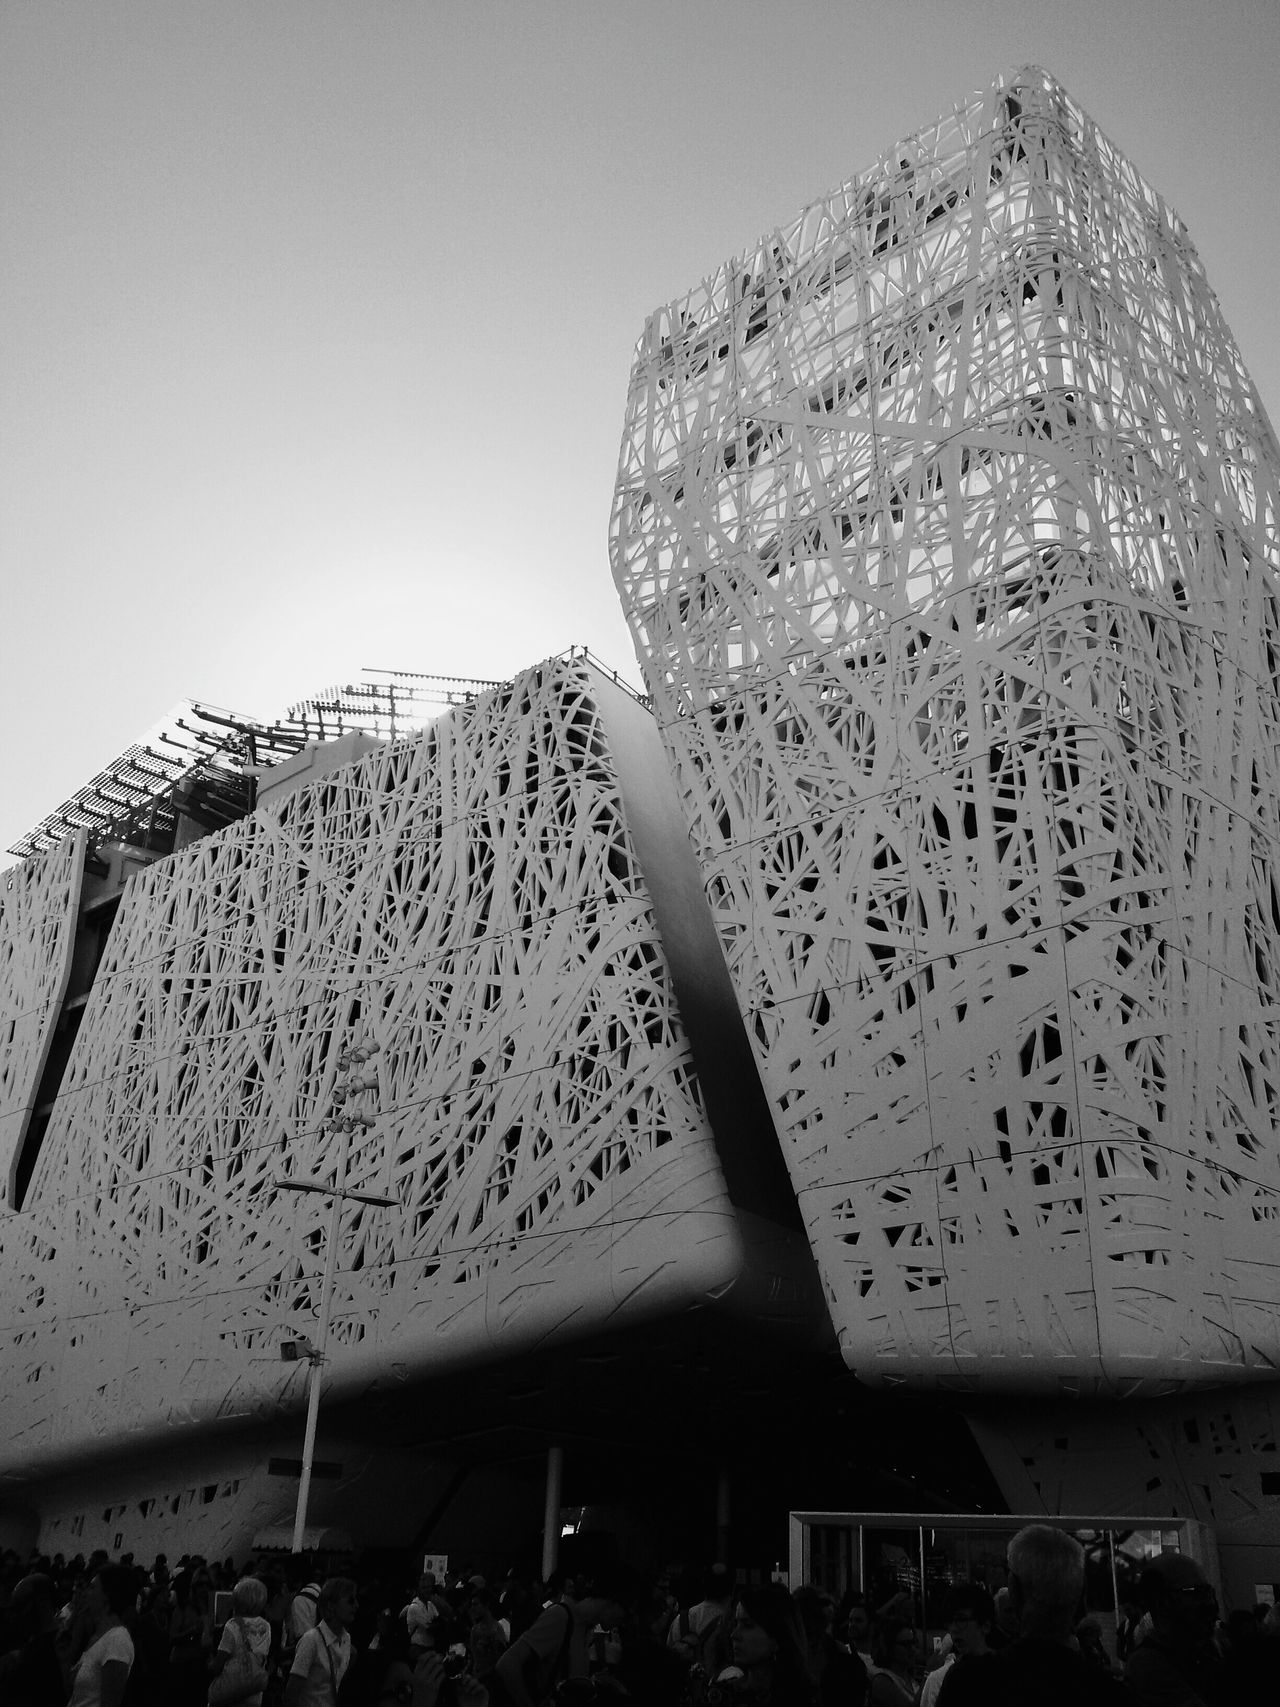 Expo 2015, Italy. Architecture Archistar Padillion Building Palace Nest Expo 2015 Milan Italy Minimalist Architecture